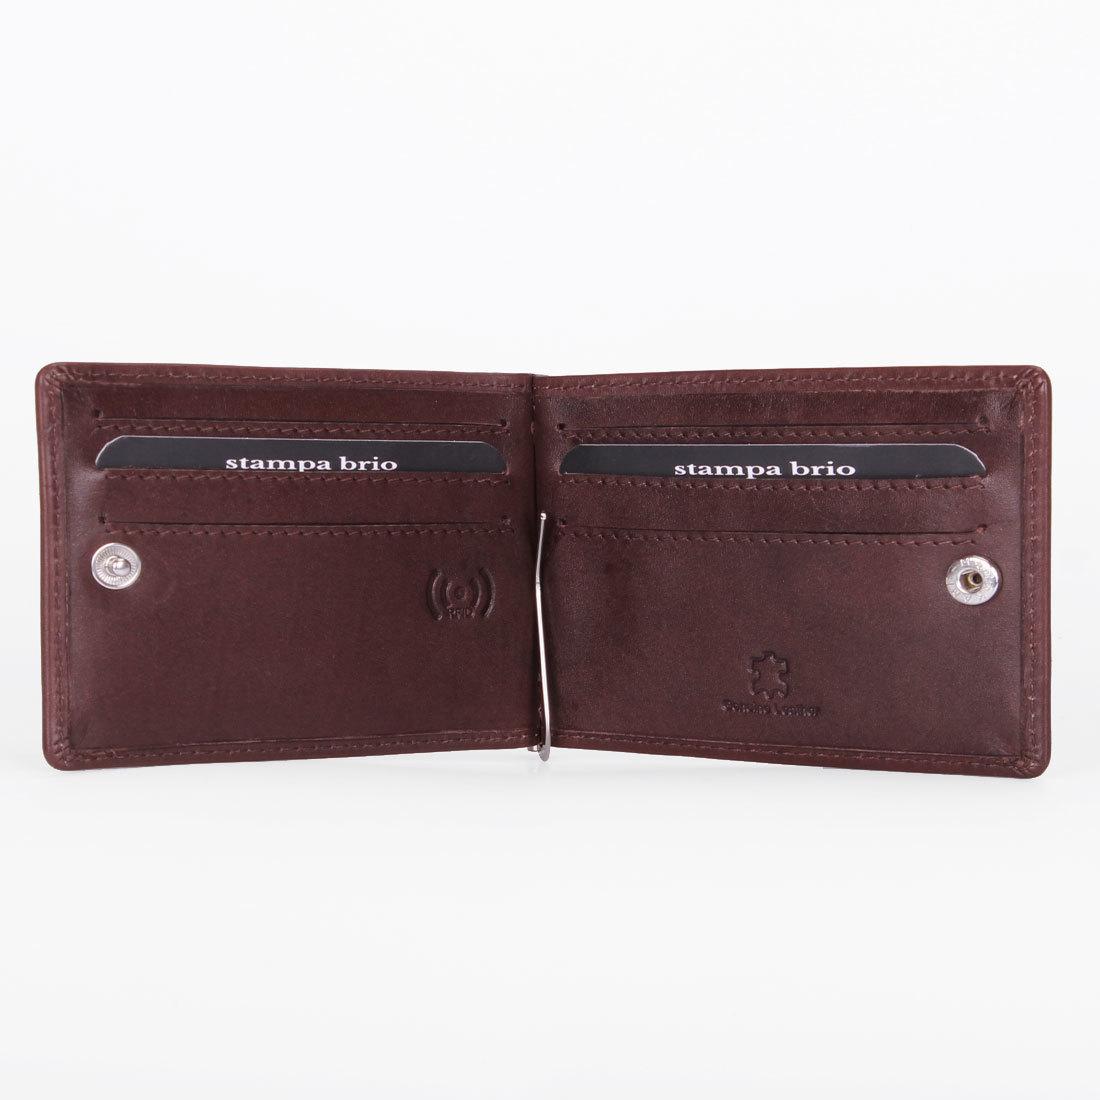 730 R - Зажим для купюр с RFID защитой без монетника